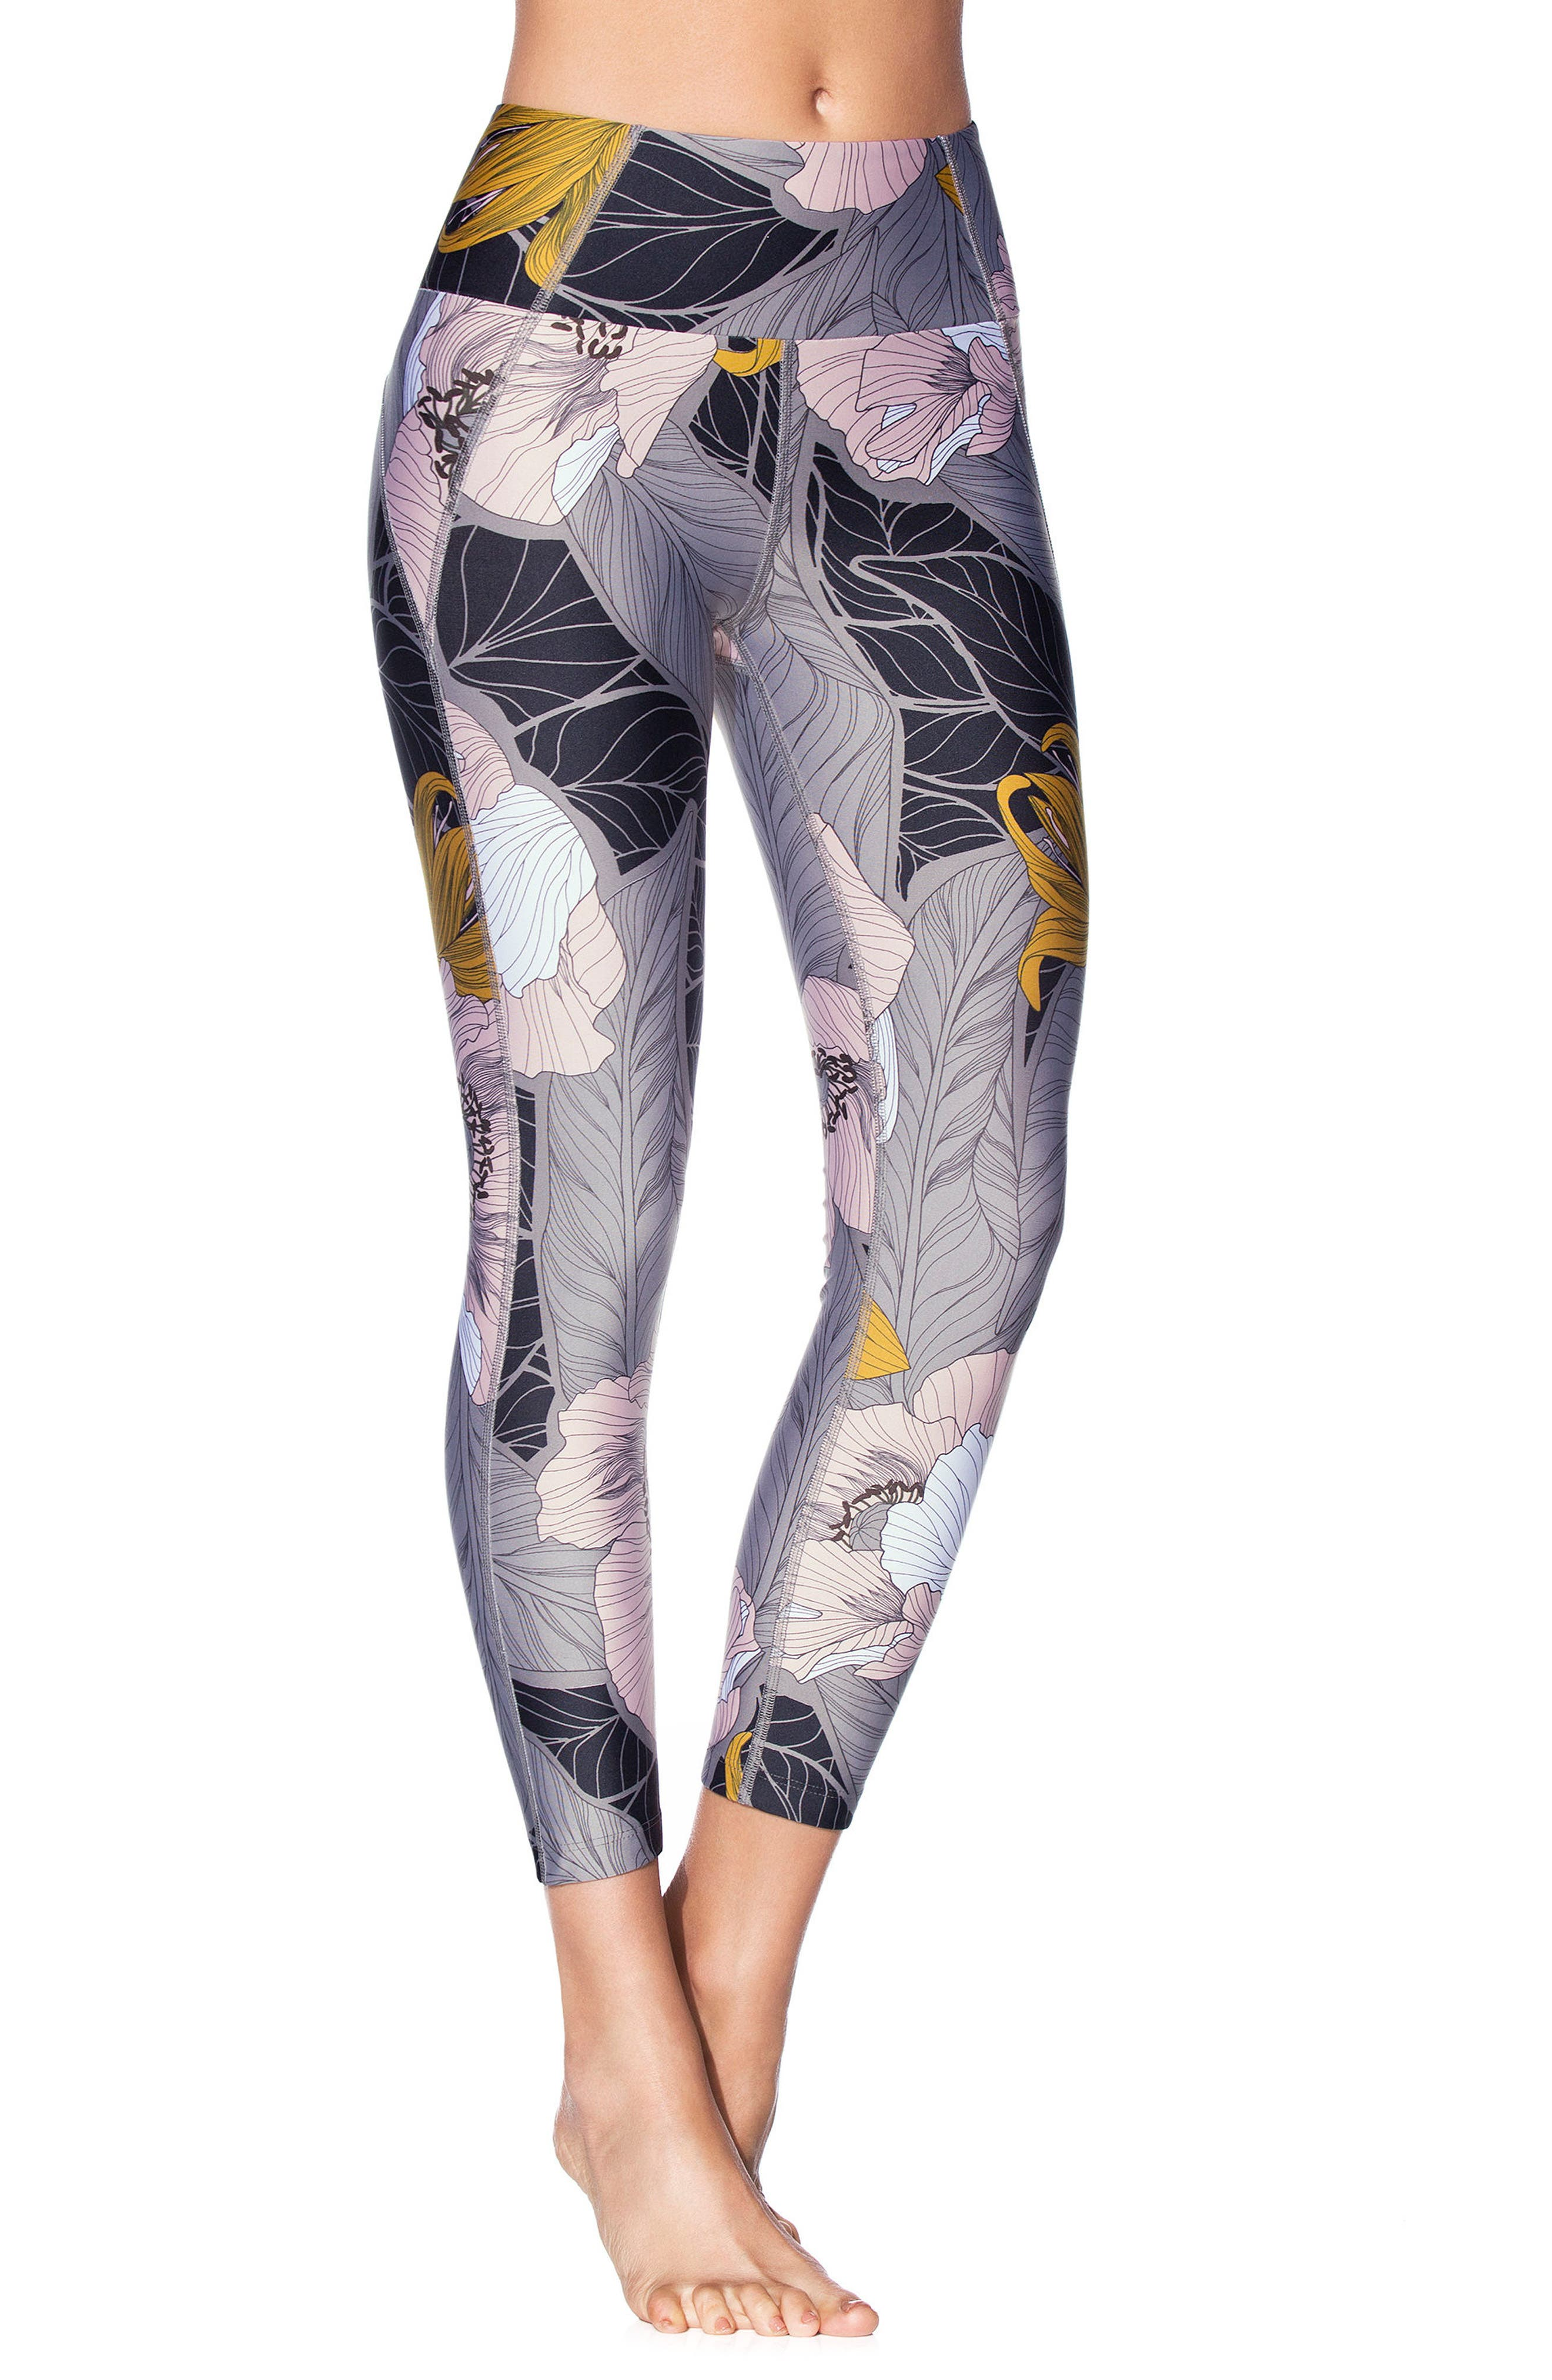 Dazeful Bloom Leggings,                         Main,                         color, BLACK MULTICOLOR